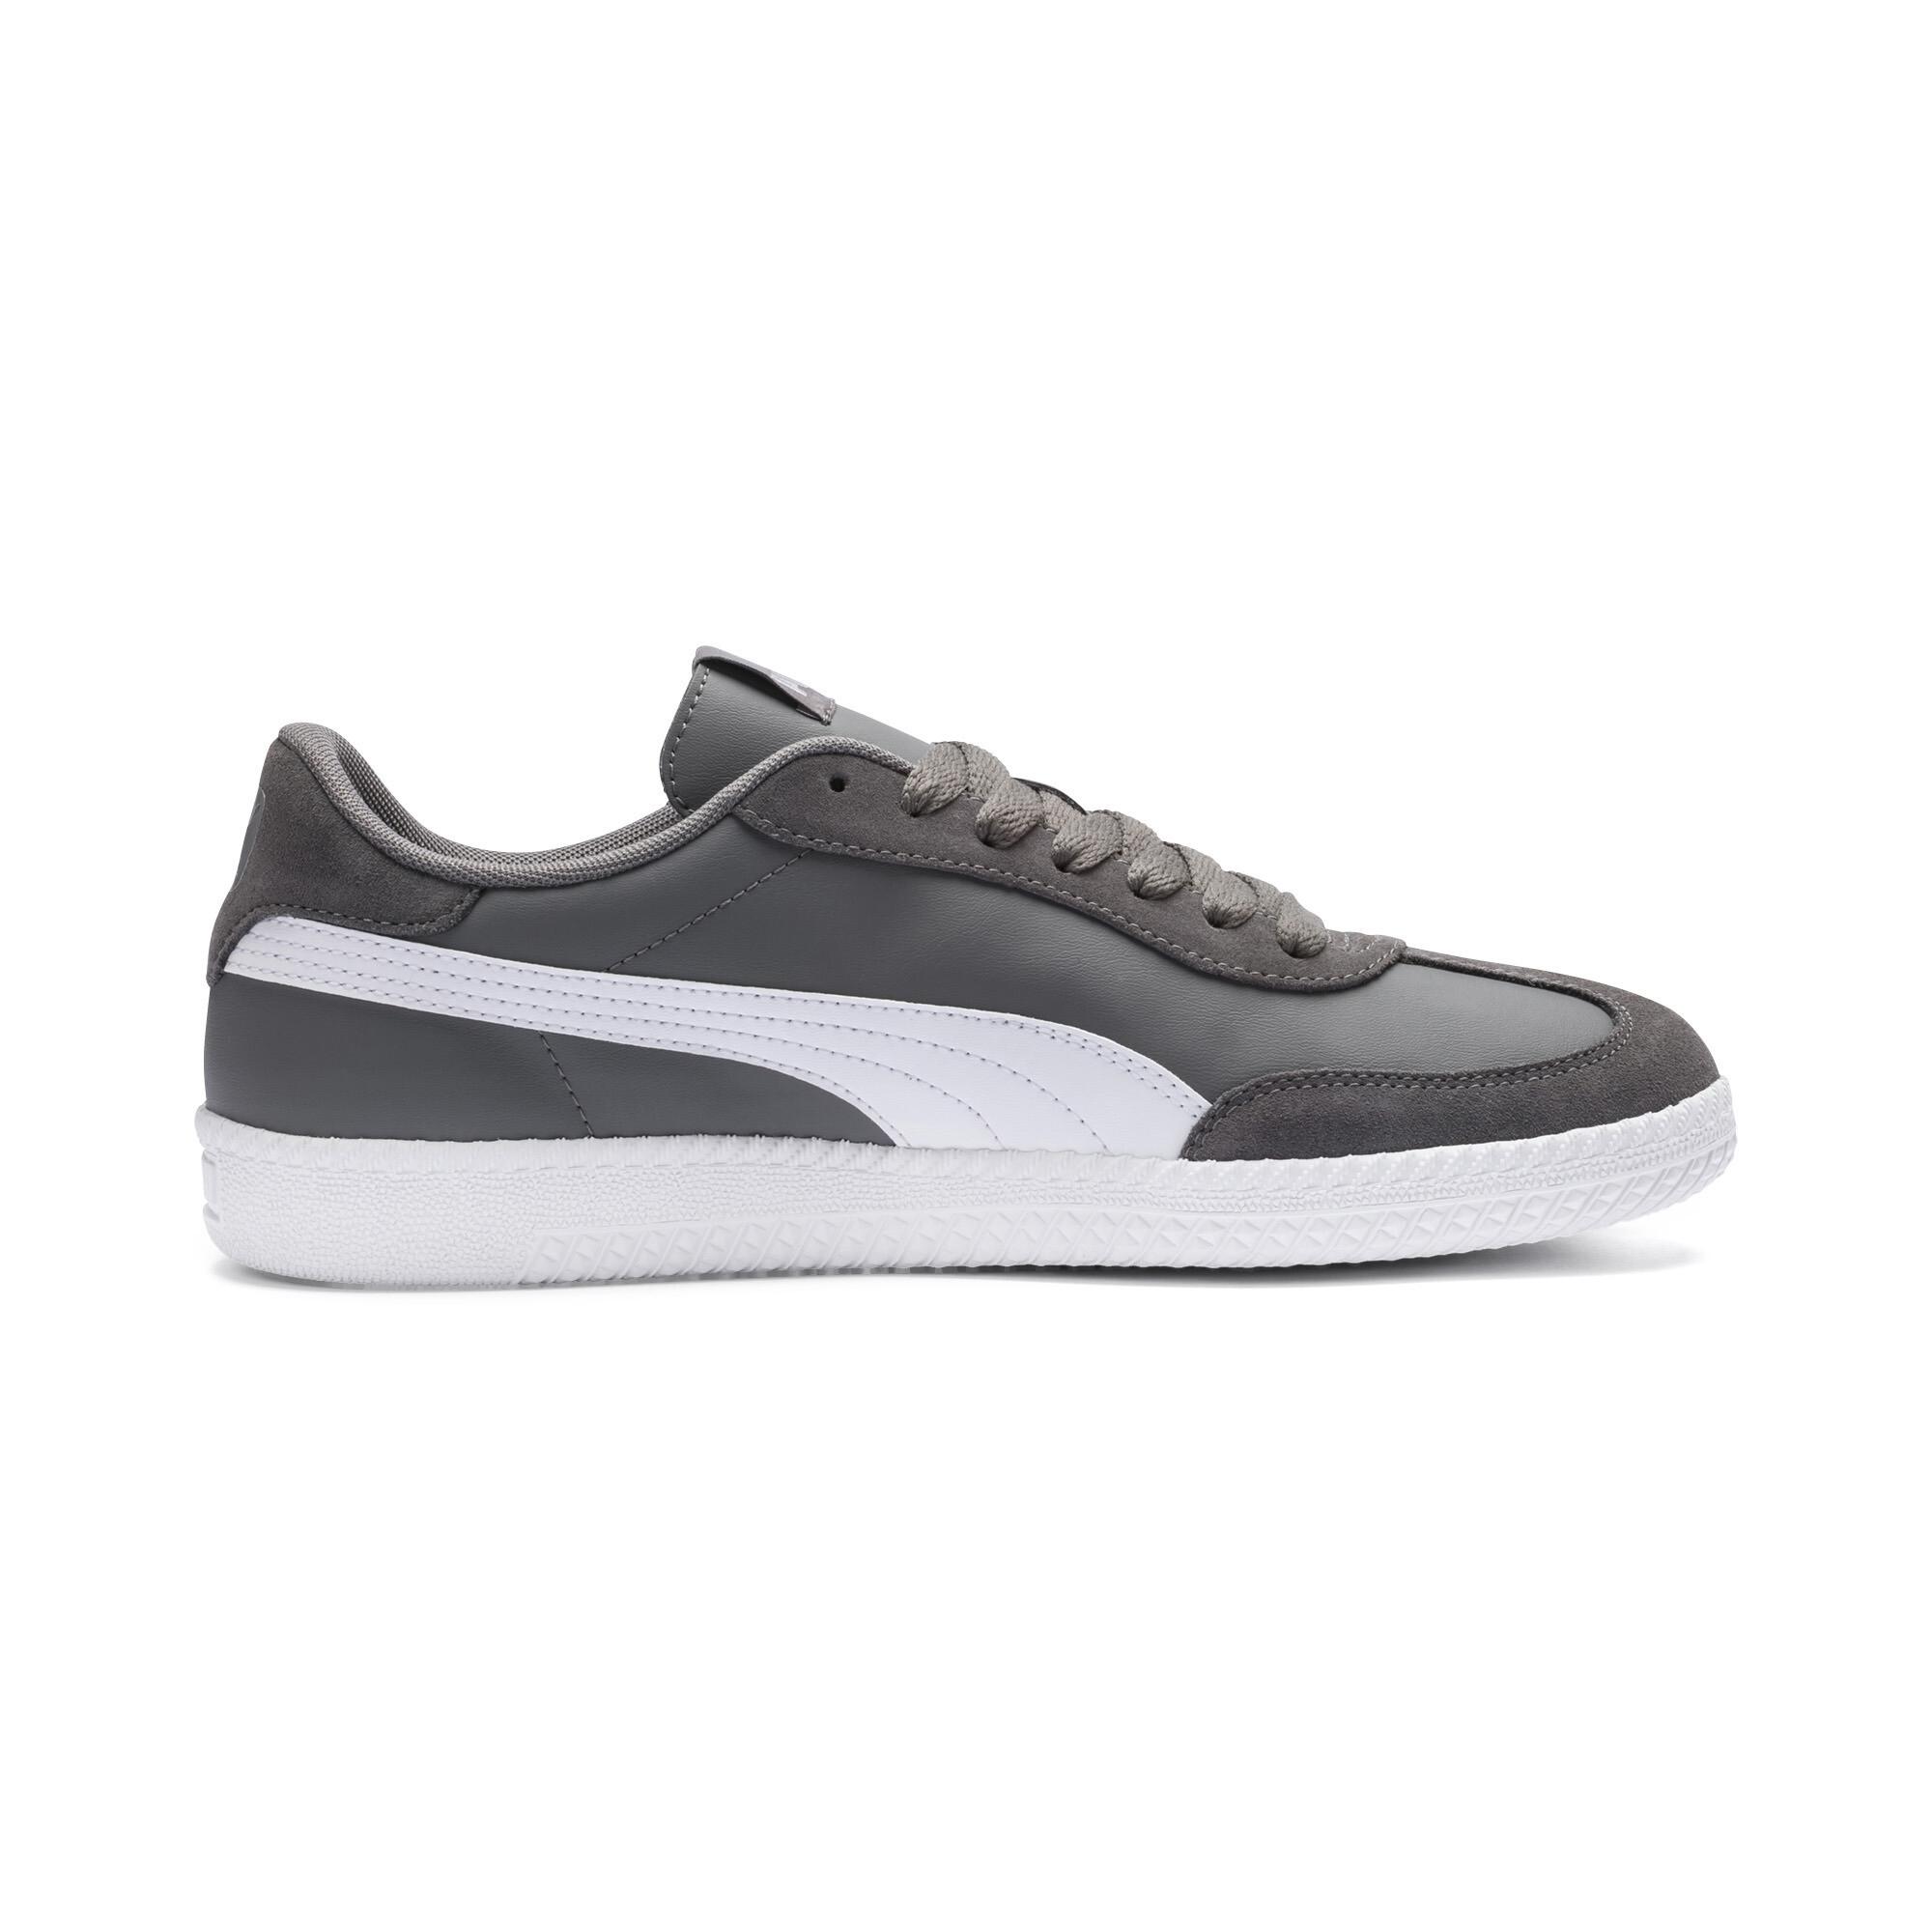 PUMA-Astro-Cup-Men-039-s-Sneakers-Men-Shoe-Basics thumbnail 23